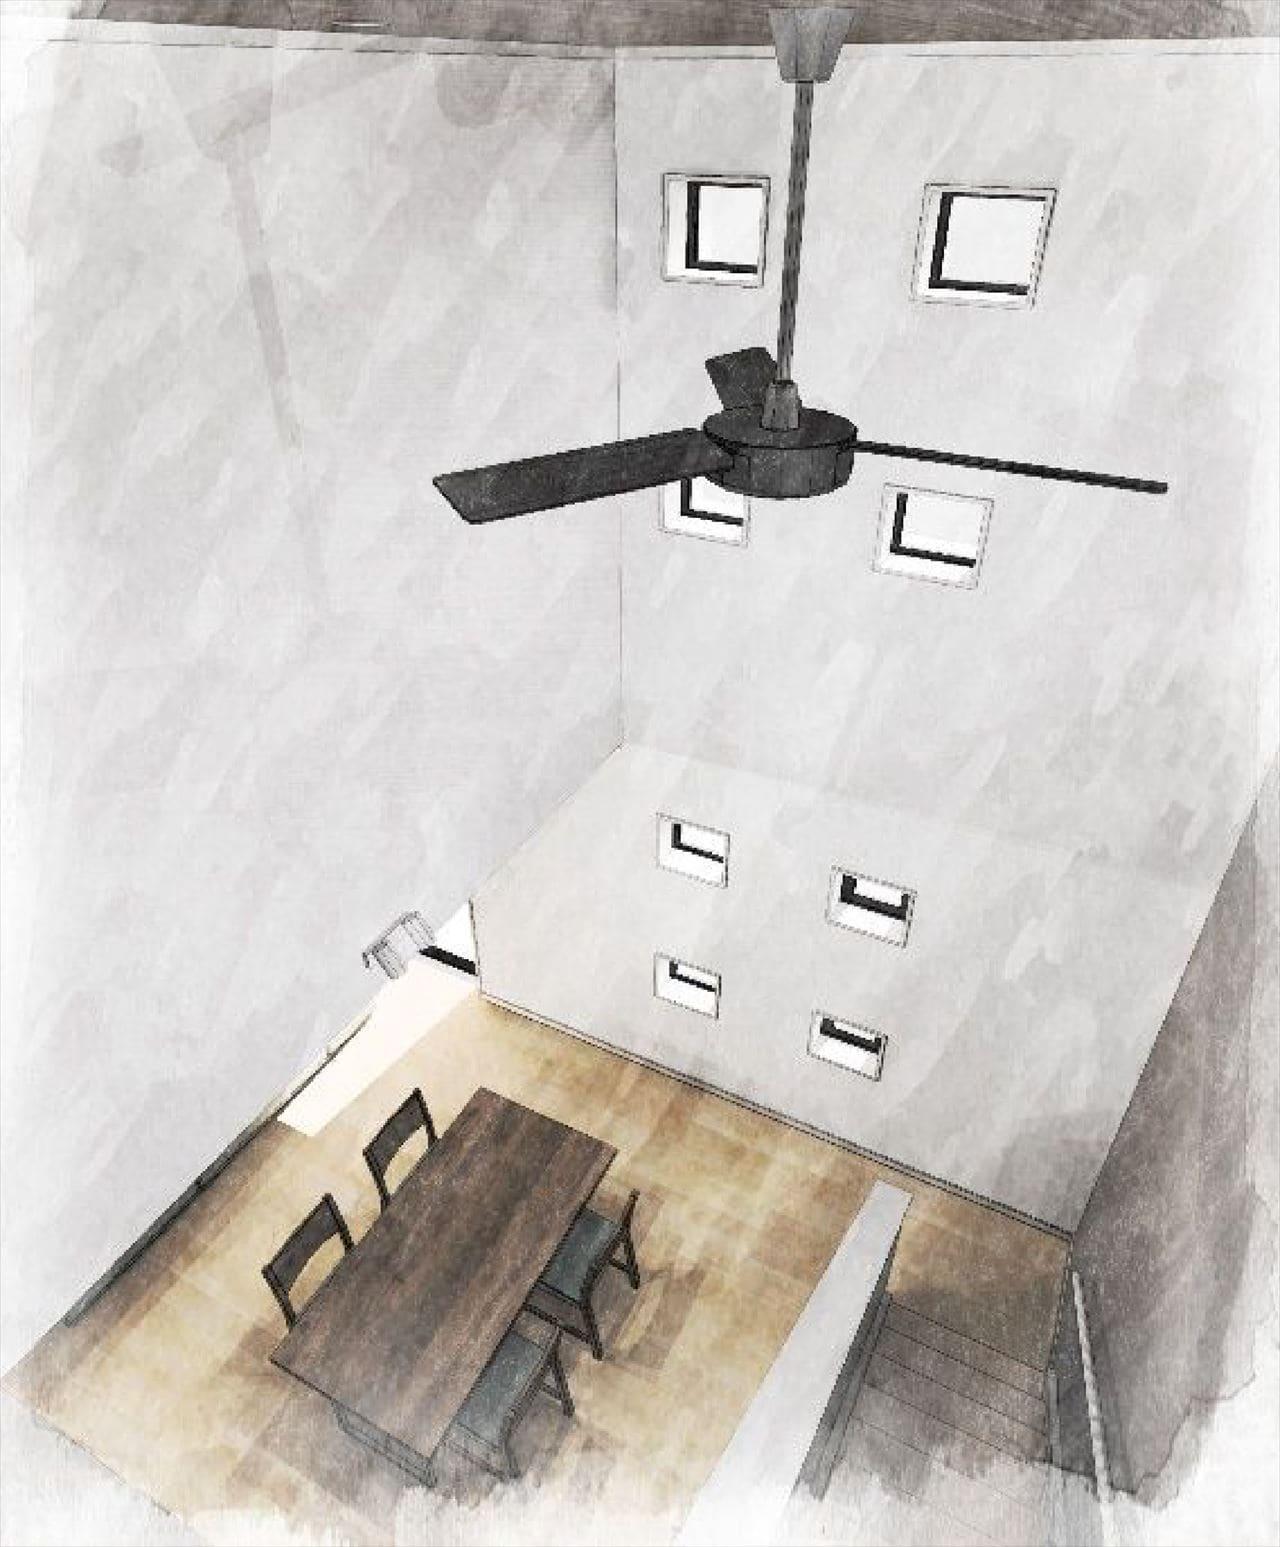 Z-4_2F『開放的な吹き抜け階段』 (自然光を取り込む 大きな吹抜けを計画。 シーリングファンを回して 空気を循環させることで、 1・2階の温度差を均一にできます。)